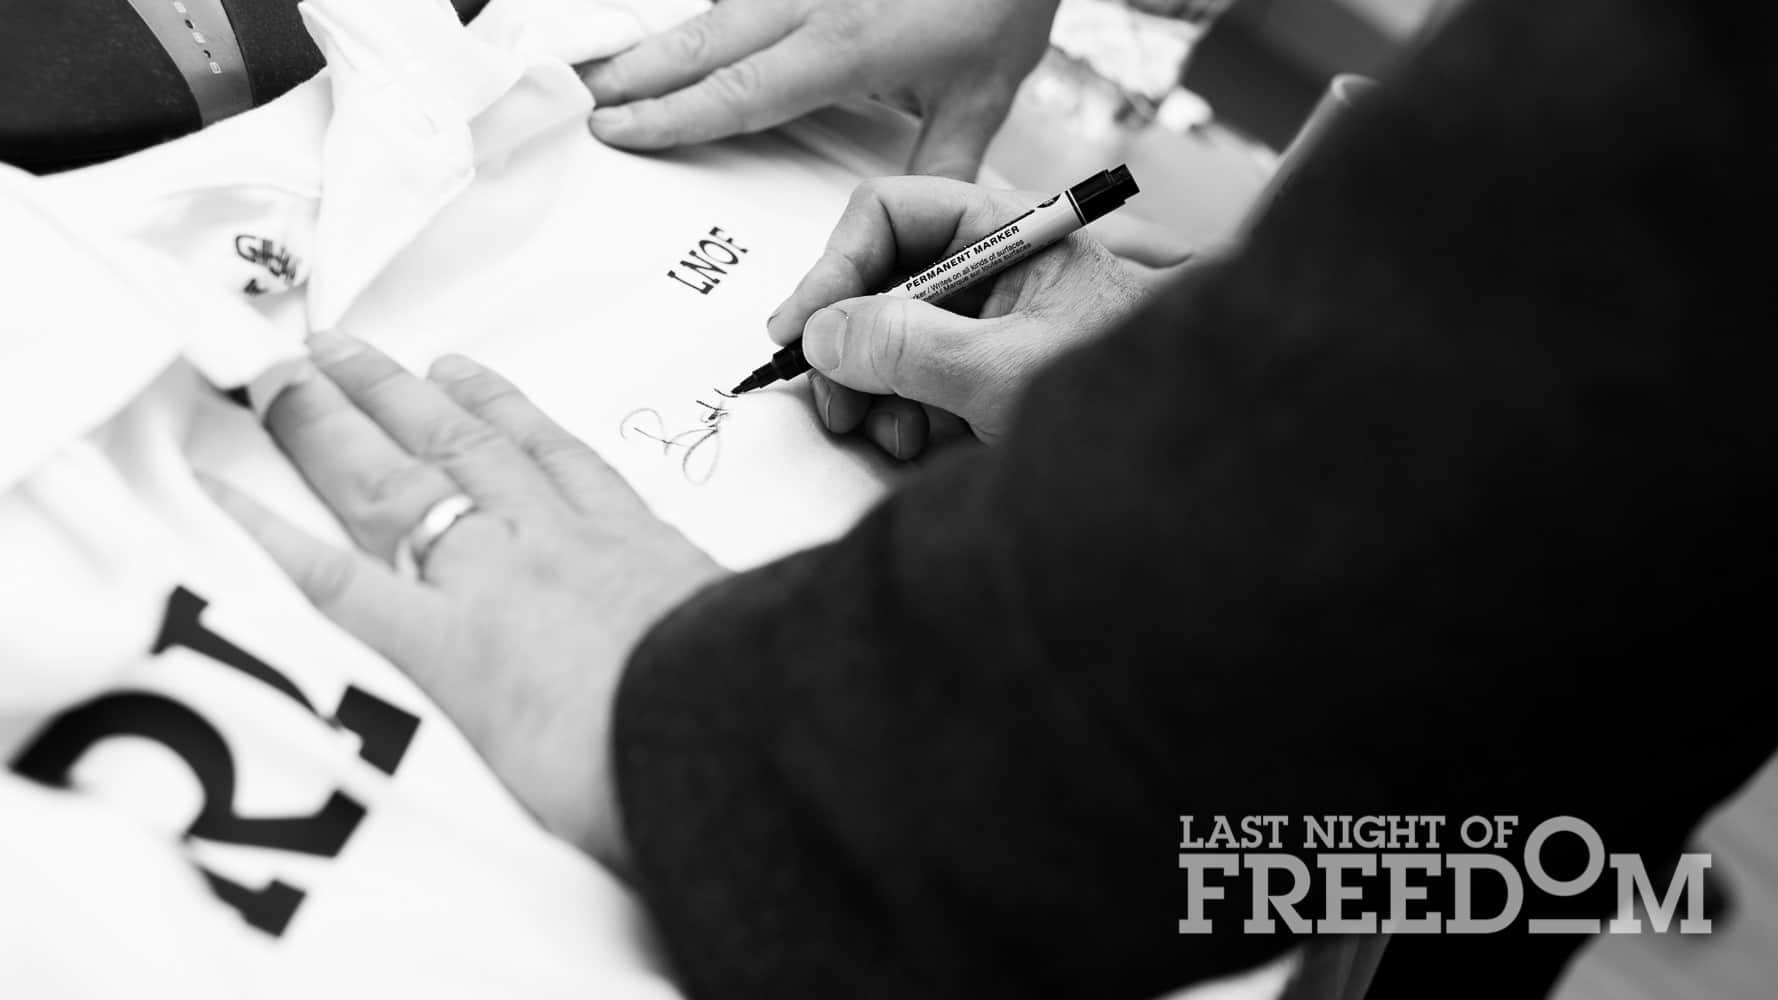 Rob Lee signing LNOF t-shirt